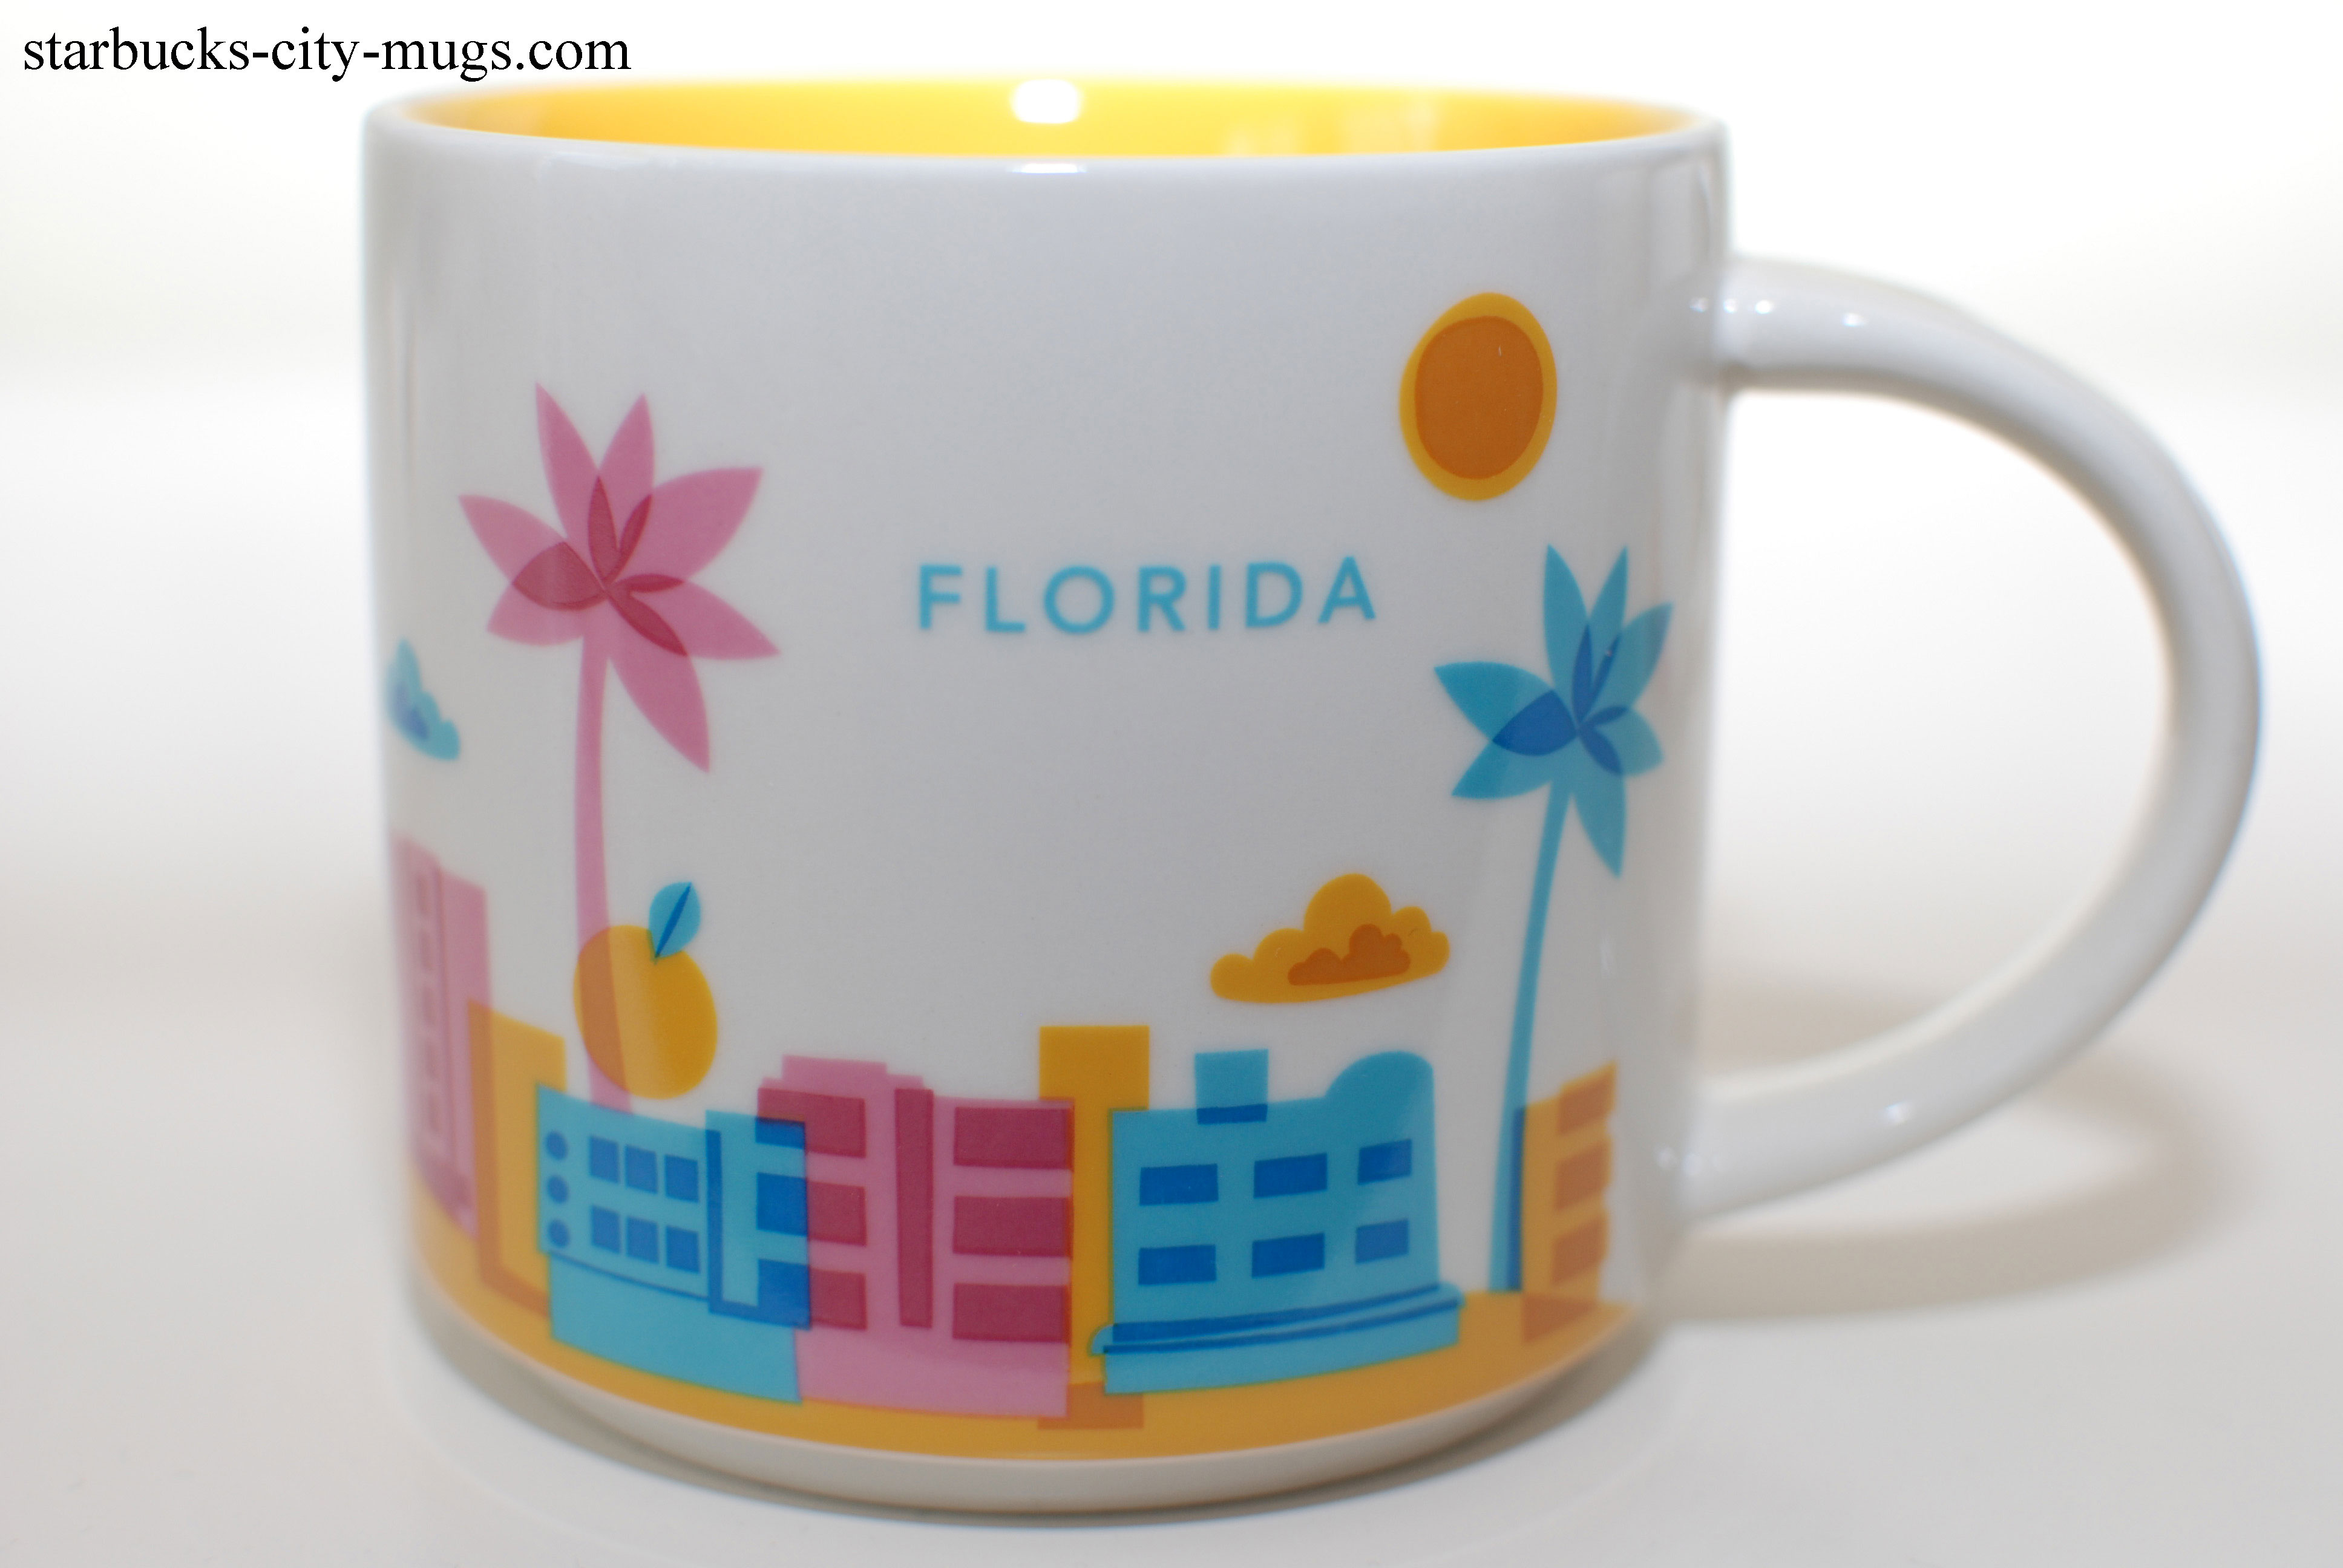 This item Starbucks Miami Coffee Mug. Starbucks Miami You Are Here Collection Ceramic Coffee Mug, 14 FL Oz. Miami Mug - Yellow Hand Painted, Florida Coffee Mugs, Miami Souvenirs, Florida Souvenirs, Florida Souvenir. Starbucks MIAMI Been There Series Across The Globe Collection Ceramic Coffee Mug.